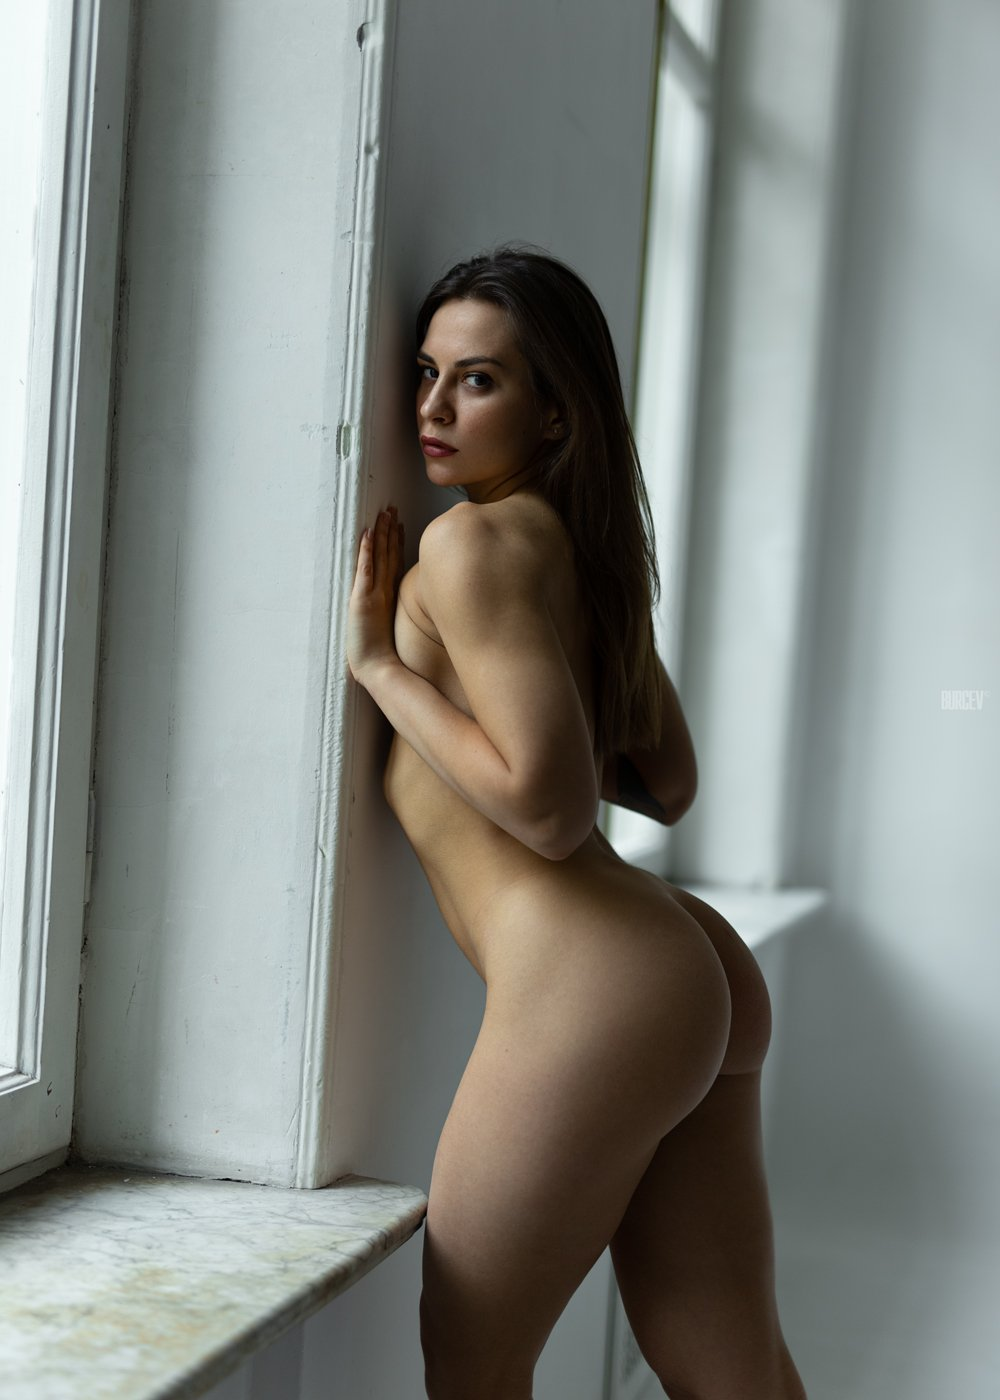 фотомодель, портрет, девушка, красивая, взгляд, woman, beautifull, portrait, canon6d, nude, sexy, fashion, red, Алексей Бурцев